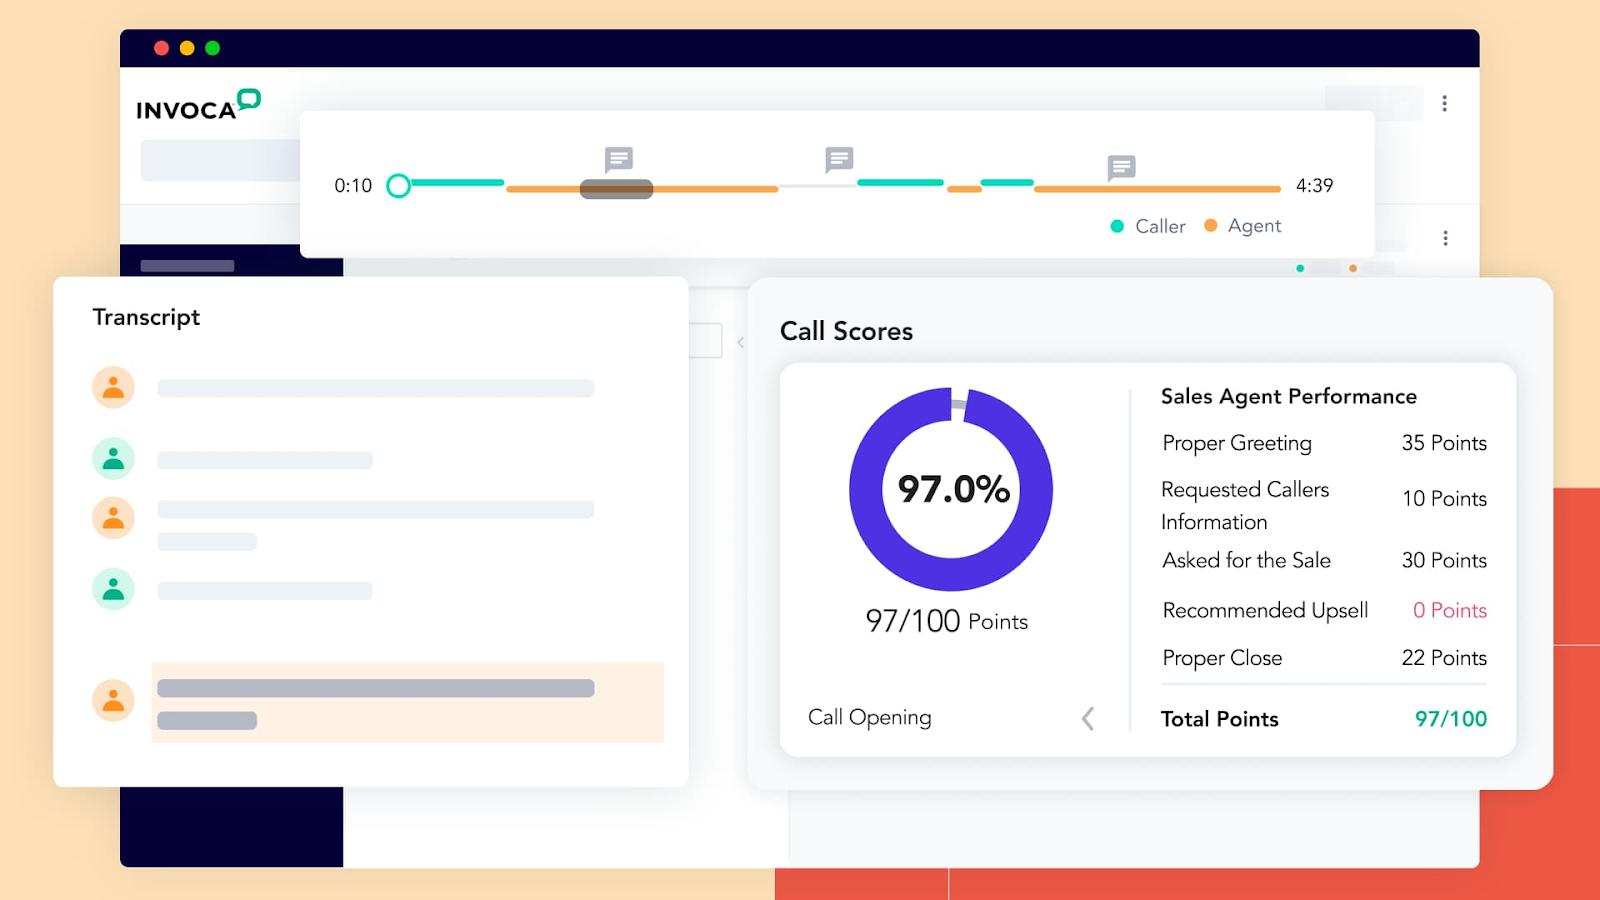 Sample Invoca sales agent performance scorecard